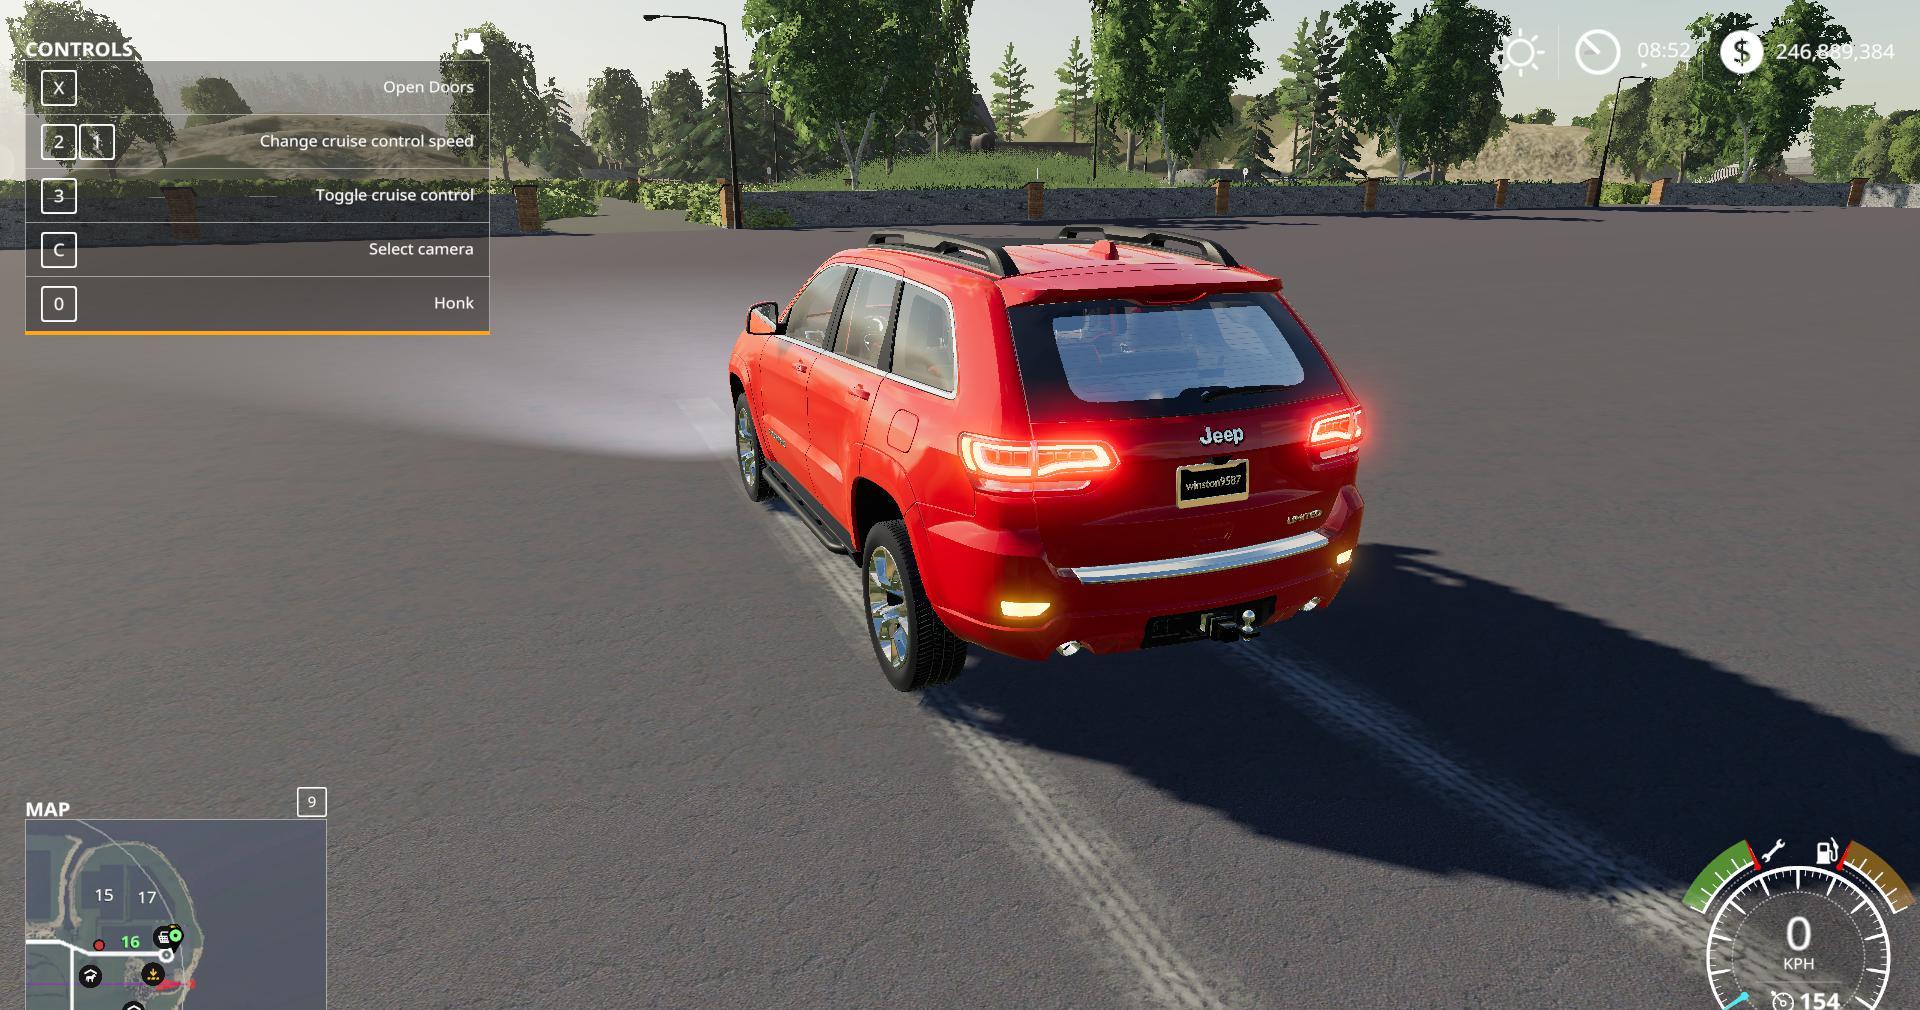 Jeep Cherokee v1 0 0 0 Mod - Farming simulator 17 / 2017 mod